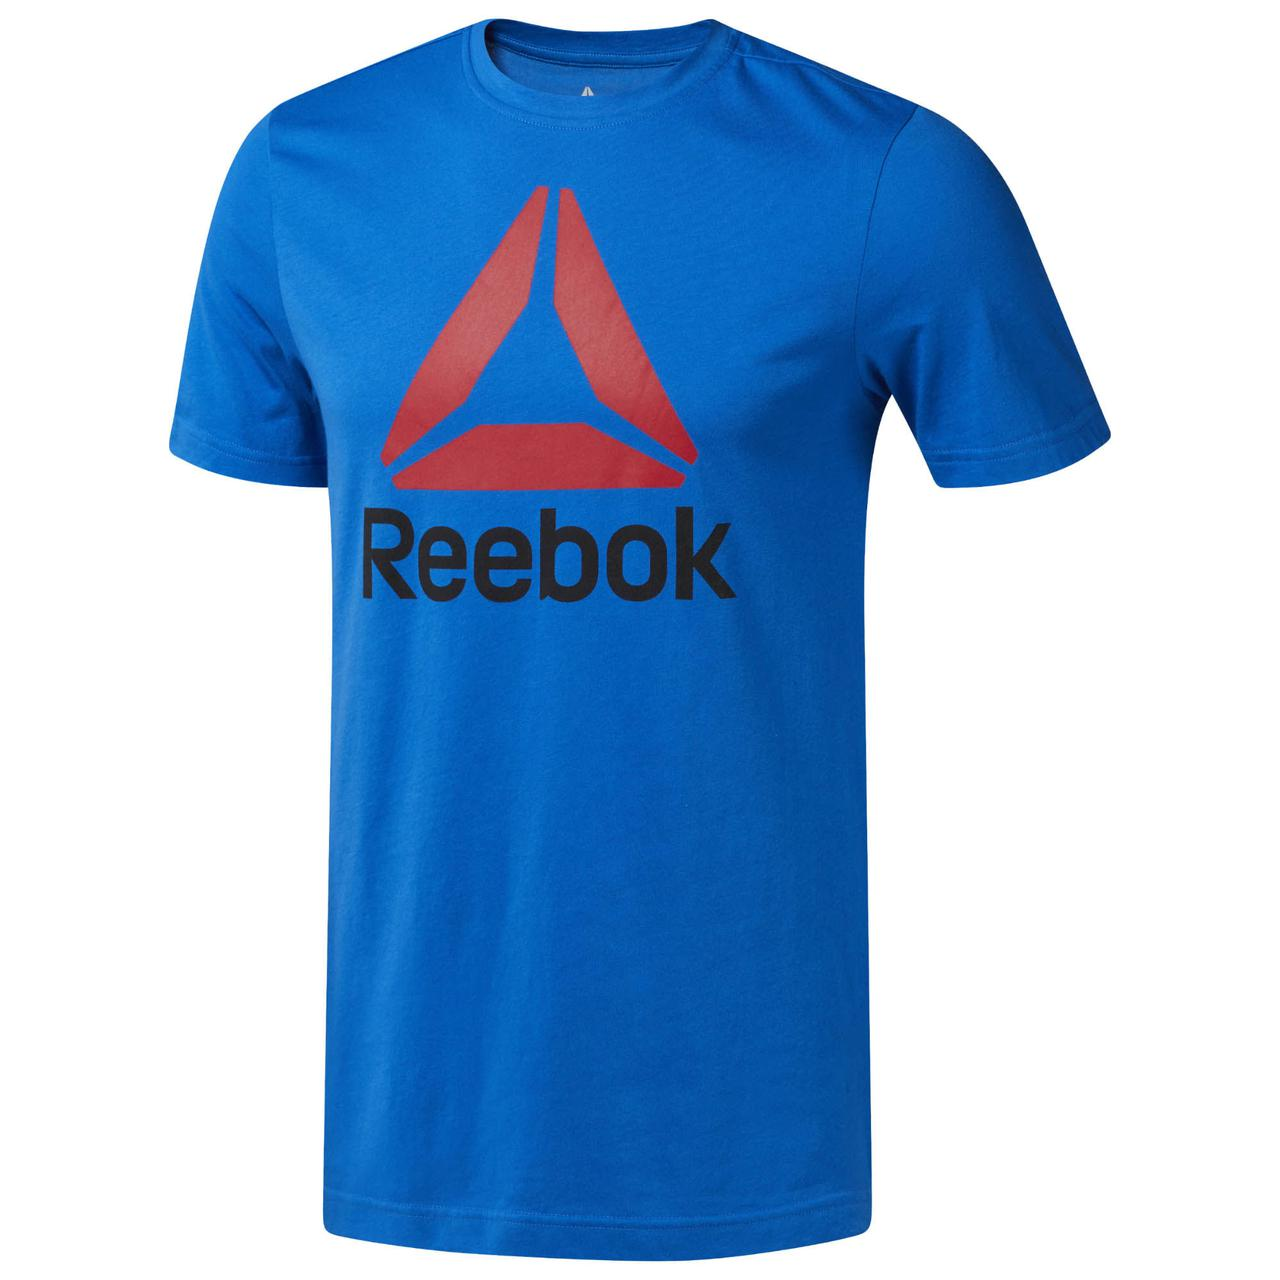 Оригинальная мужская футболка Reebok QQR- REEBOK STACKED